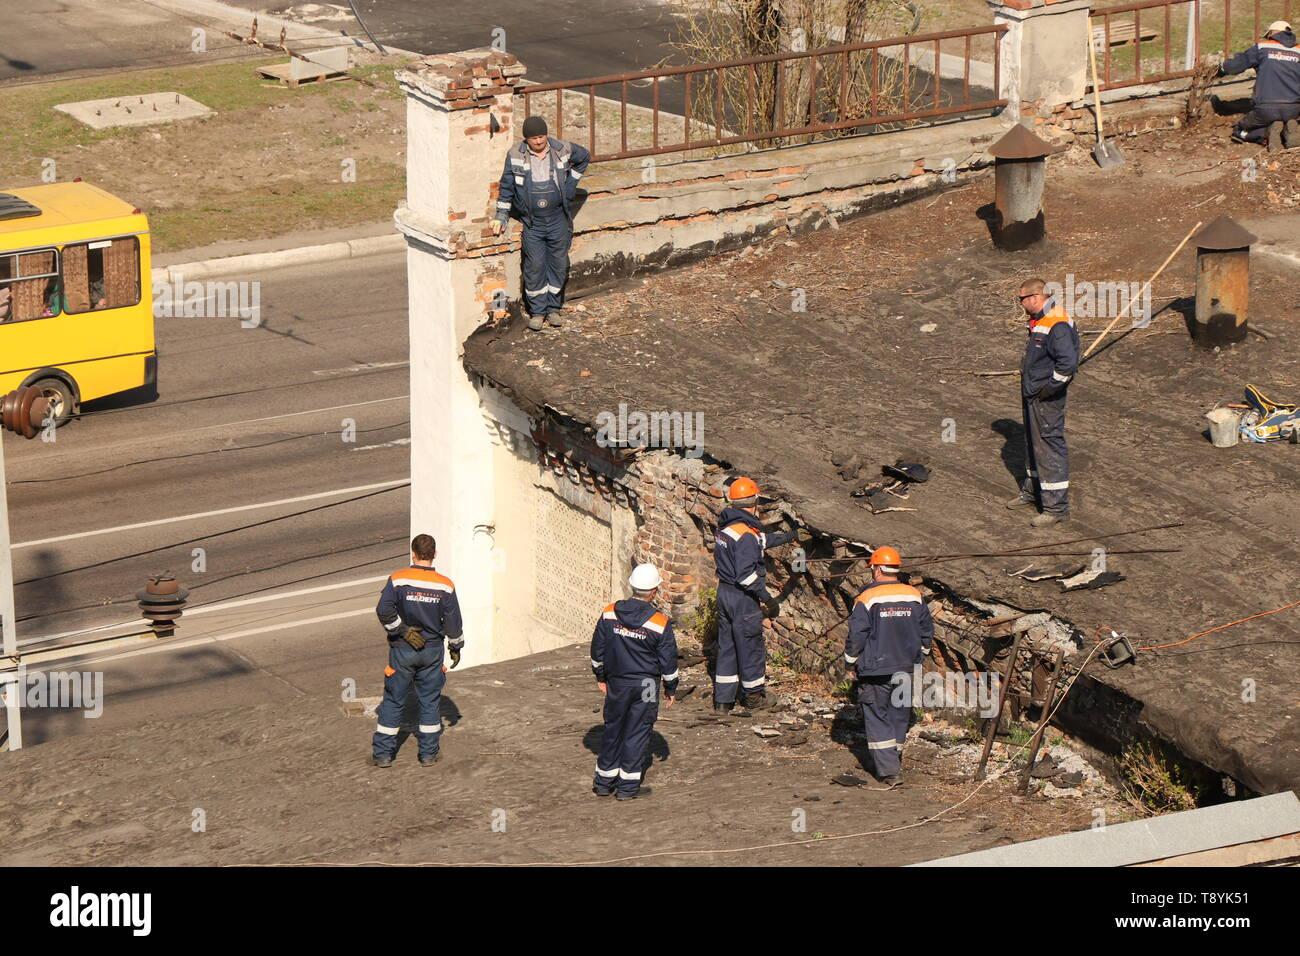 Kremenchug, Poltava region, Ukraine, April 9, 2019, repair of the old roof of the building - Stock Image